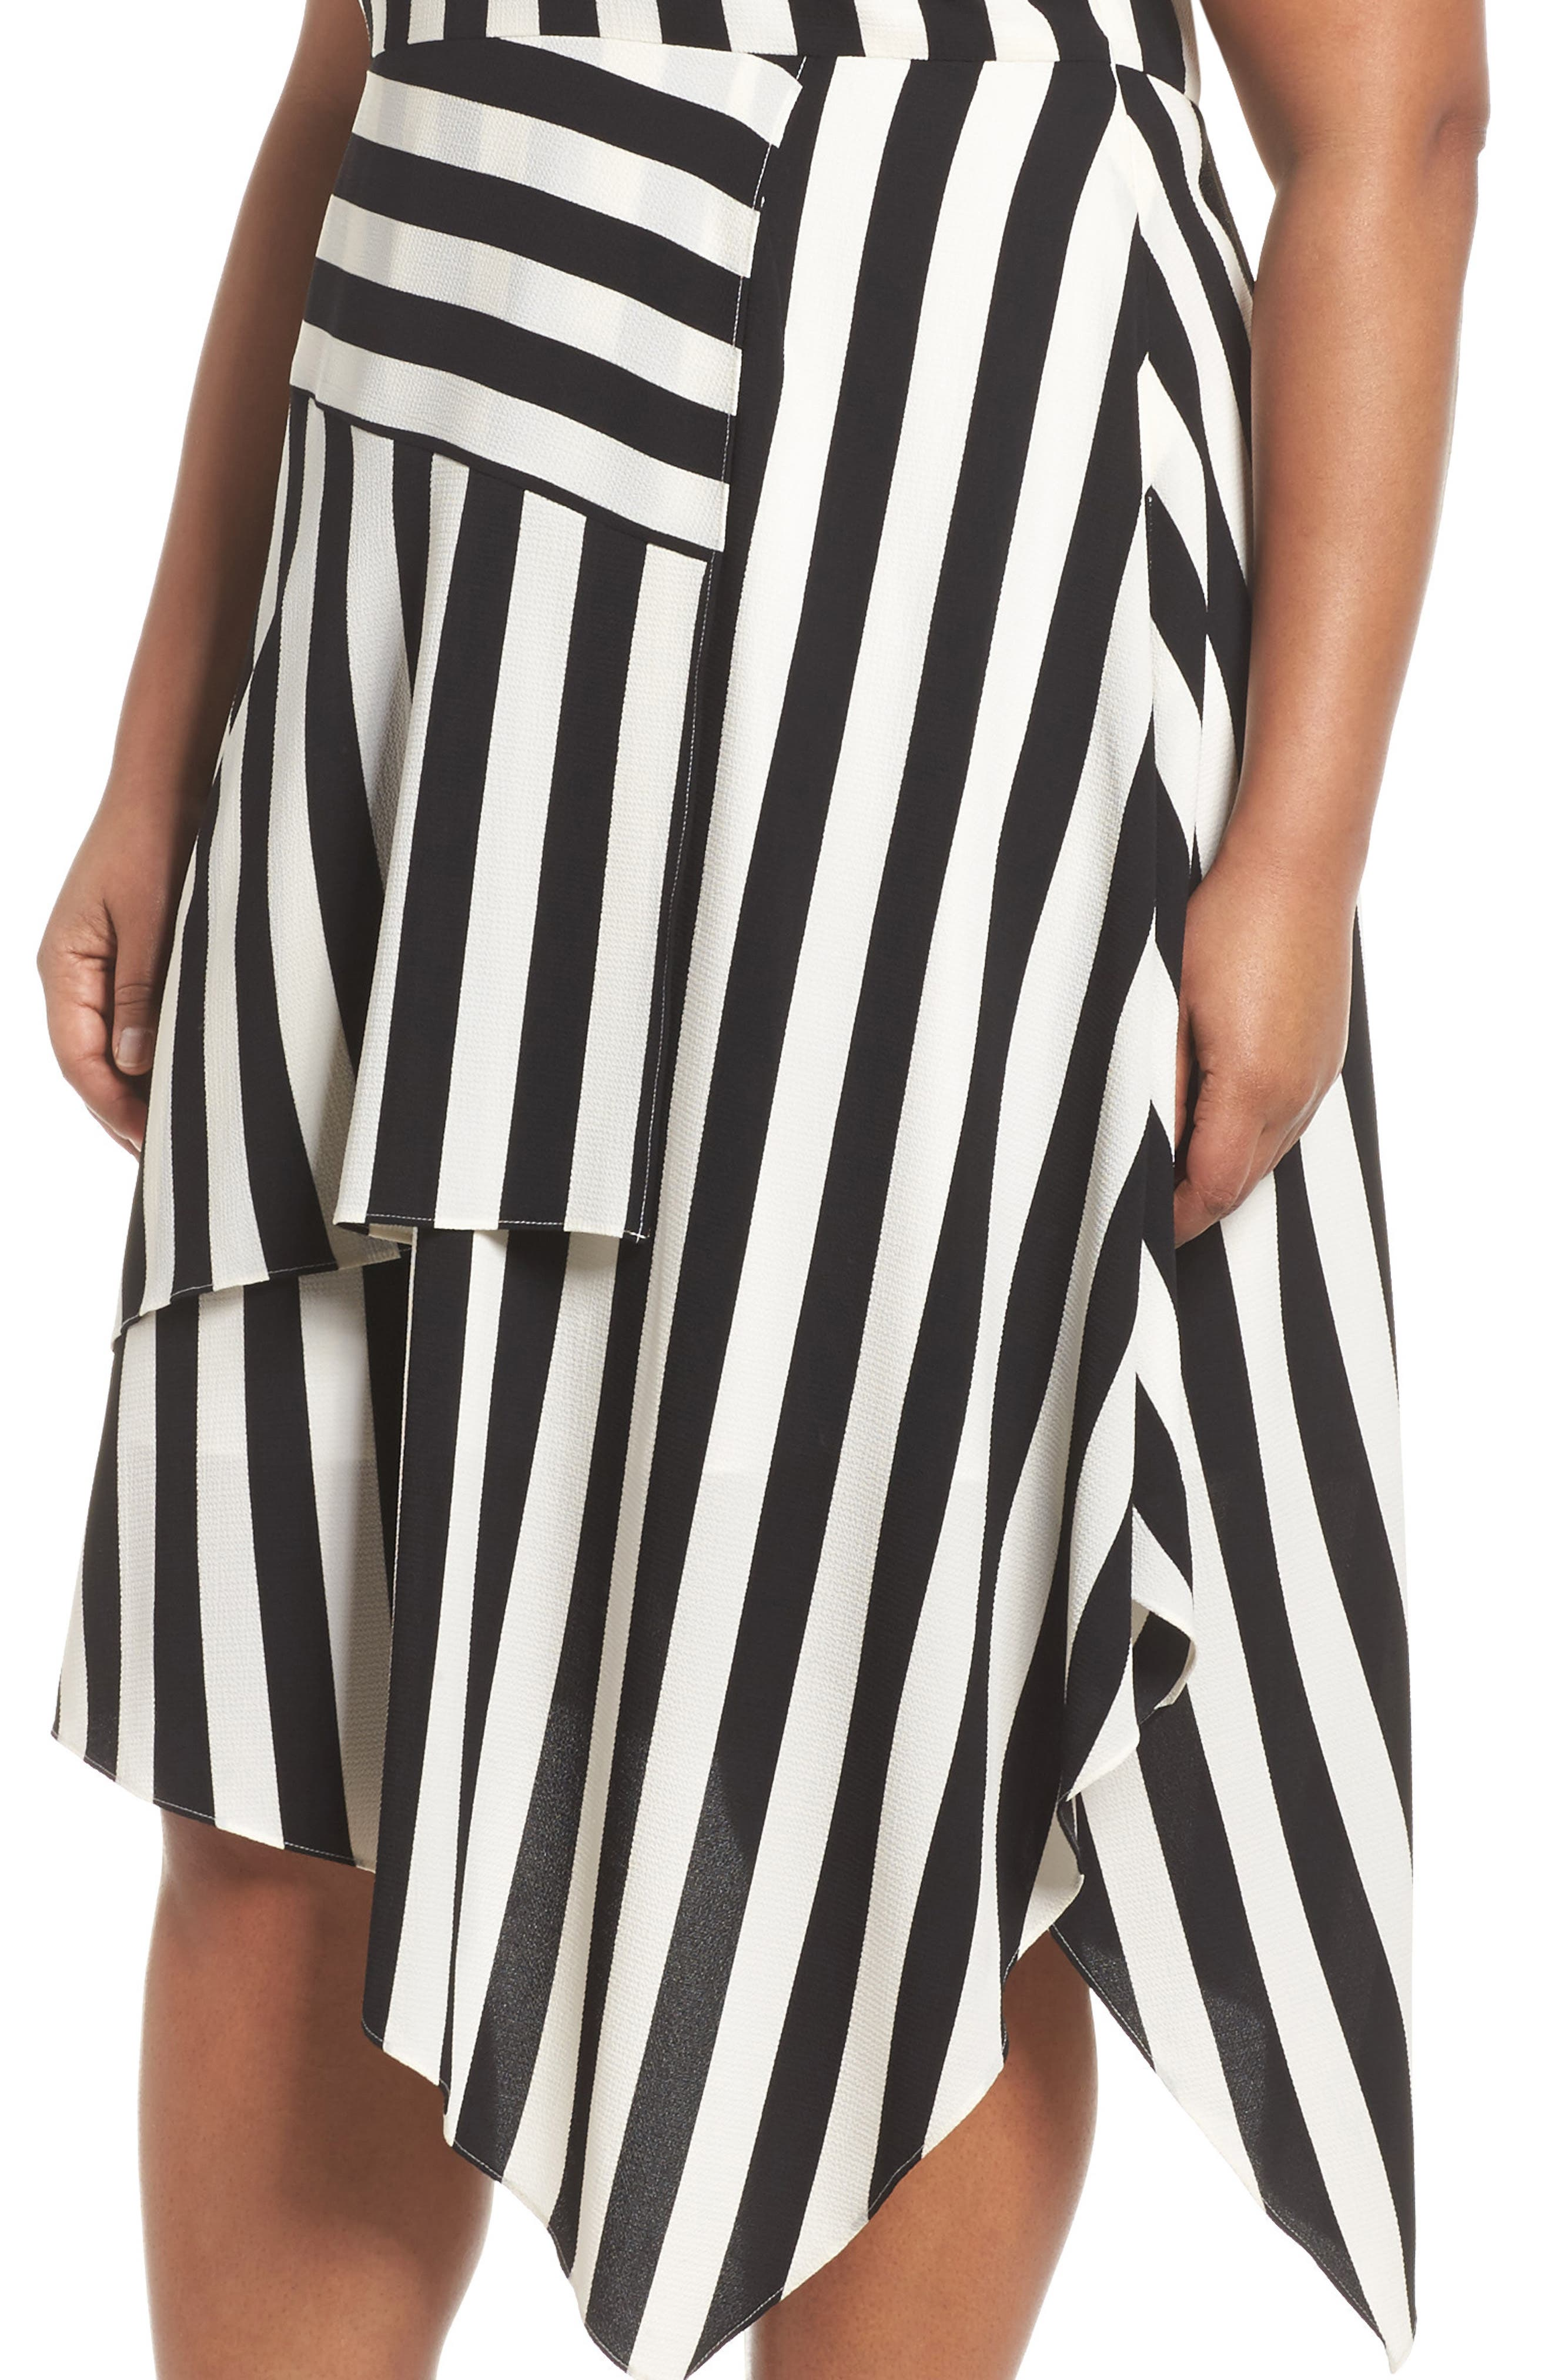 Spectator Asymmetrical Hem Dress,                             Alternate thumbnail 4, color,                             RICH BLACK